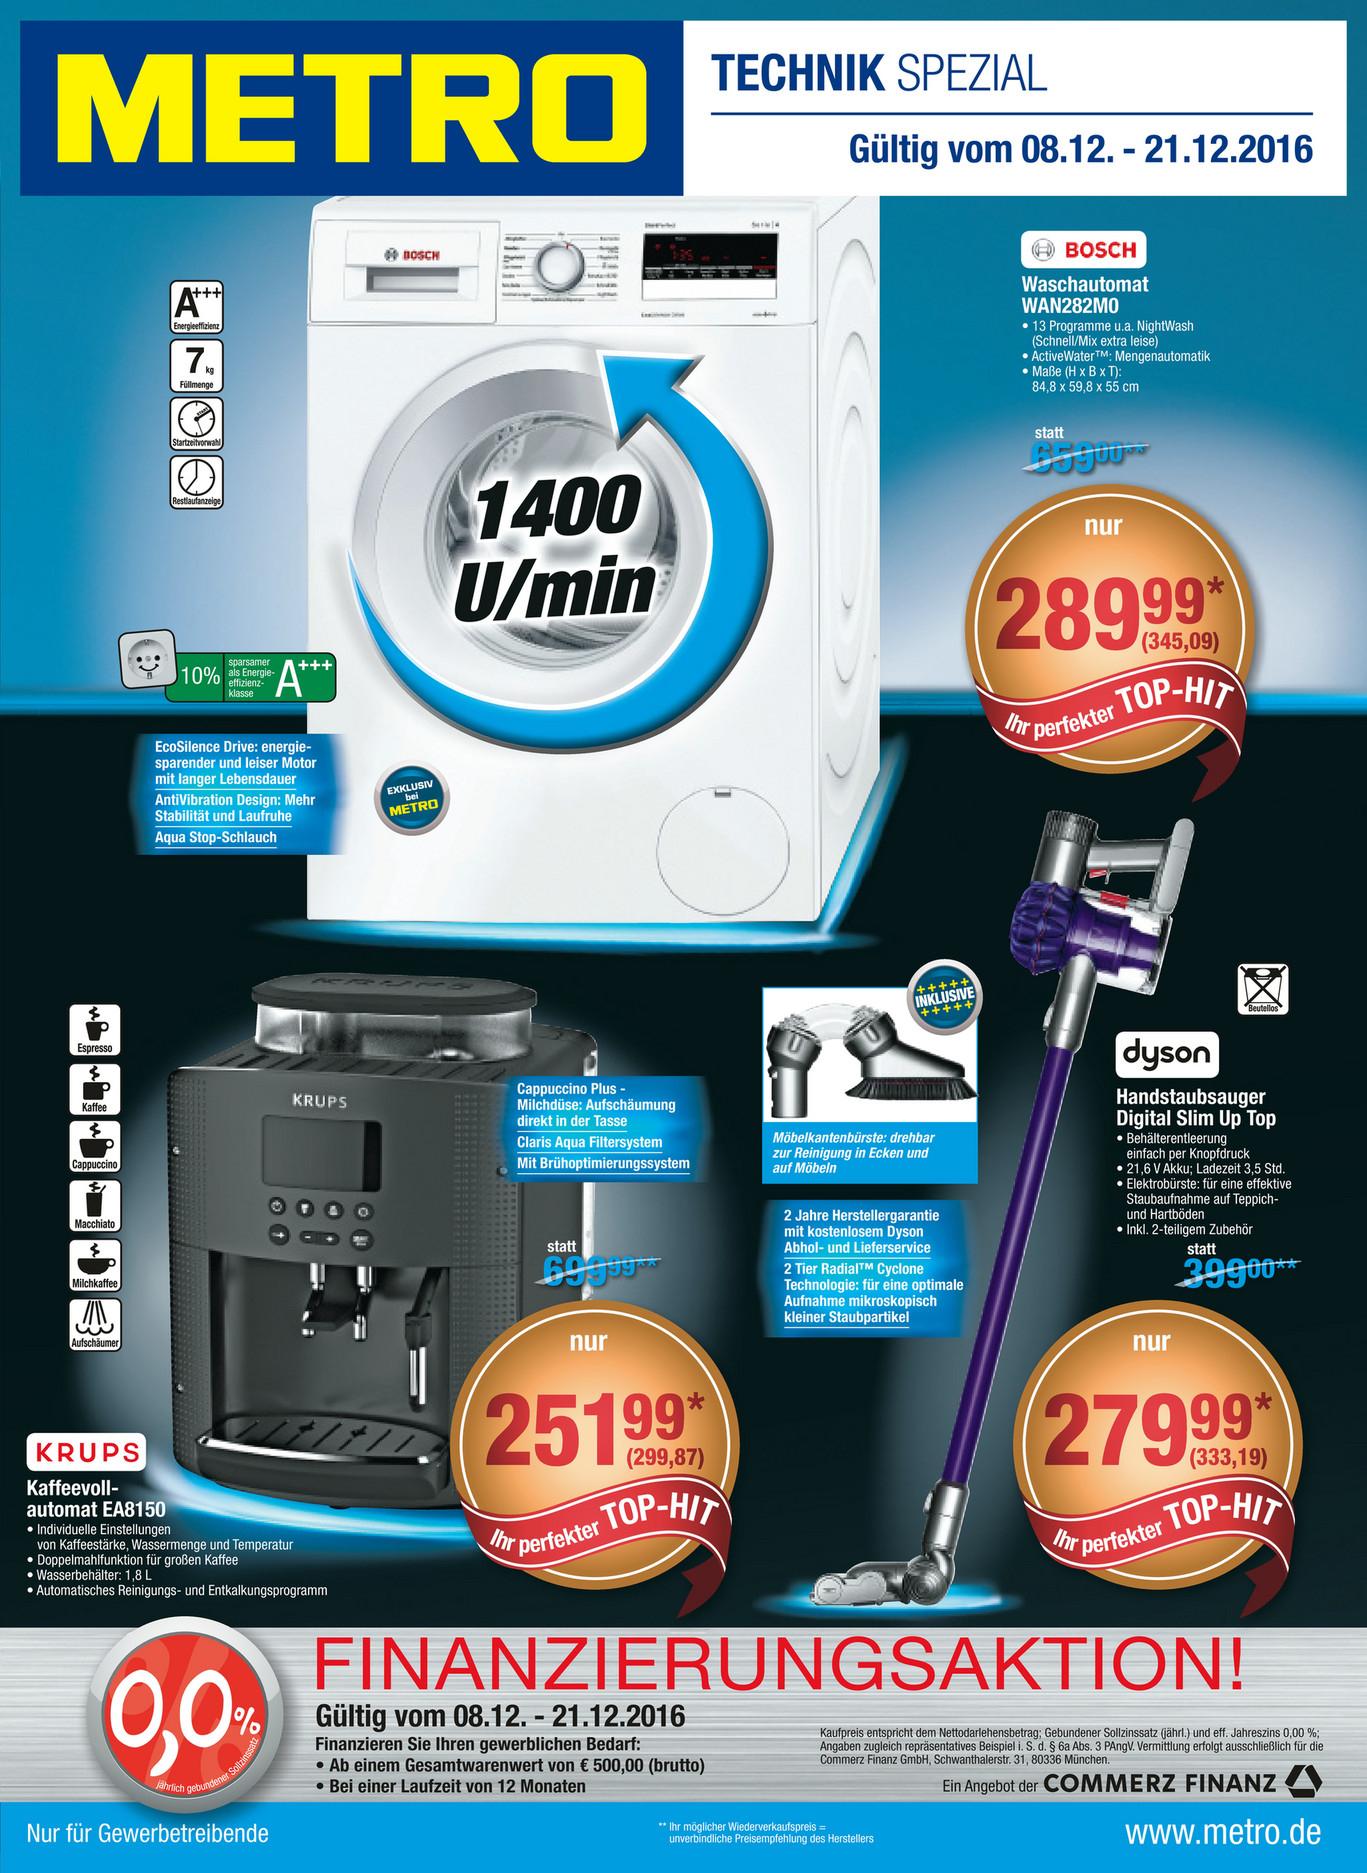 [Metro ab 08.12.] Bosch WAN282H0 Waschmaschine 7kg A+++ 1400 U/min 13 Programme Mengenautomatik